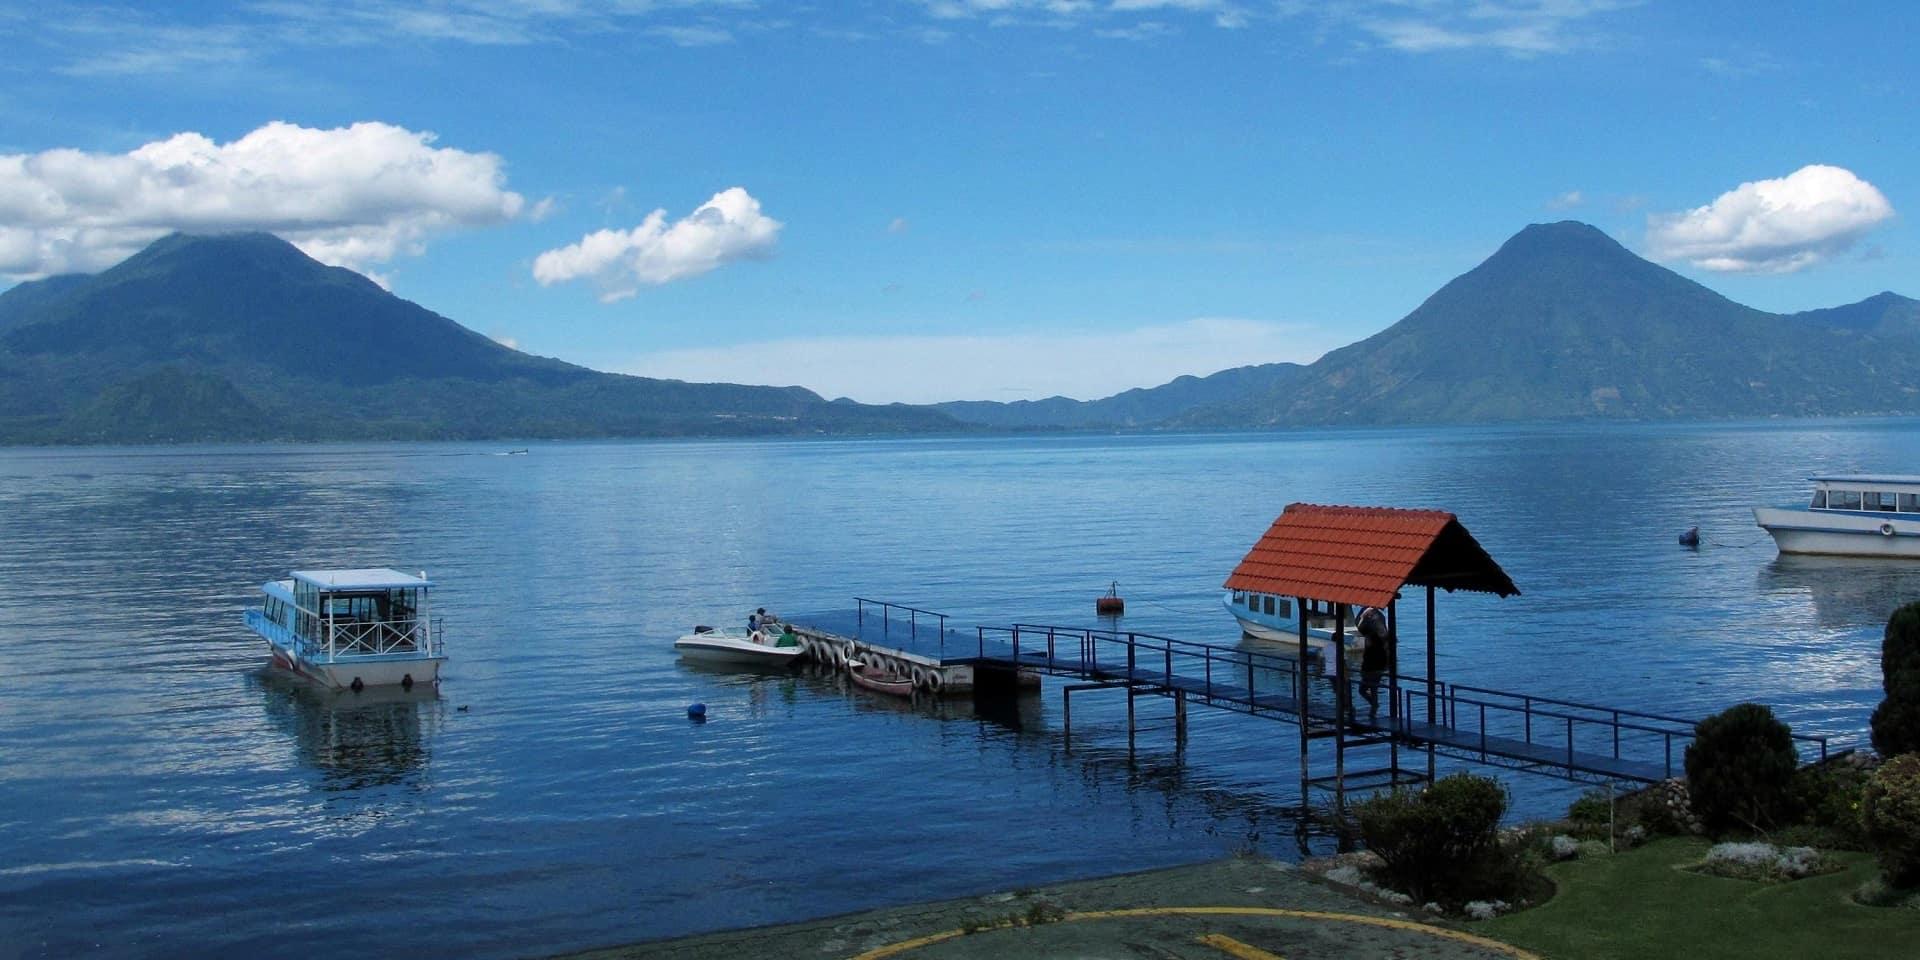 https://unicondor.com.ua/uploads/images/ekskursionnyy-tur-v-gvatemalu-ozero-atitlan.jpg